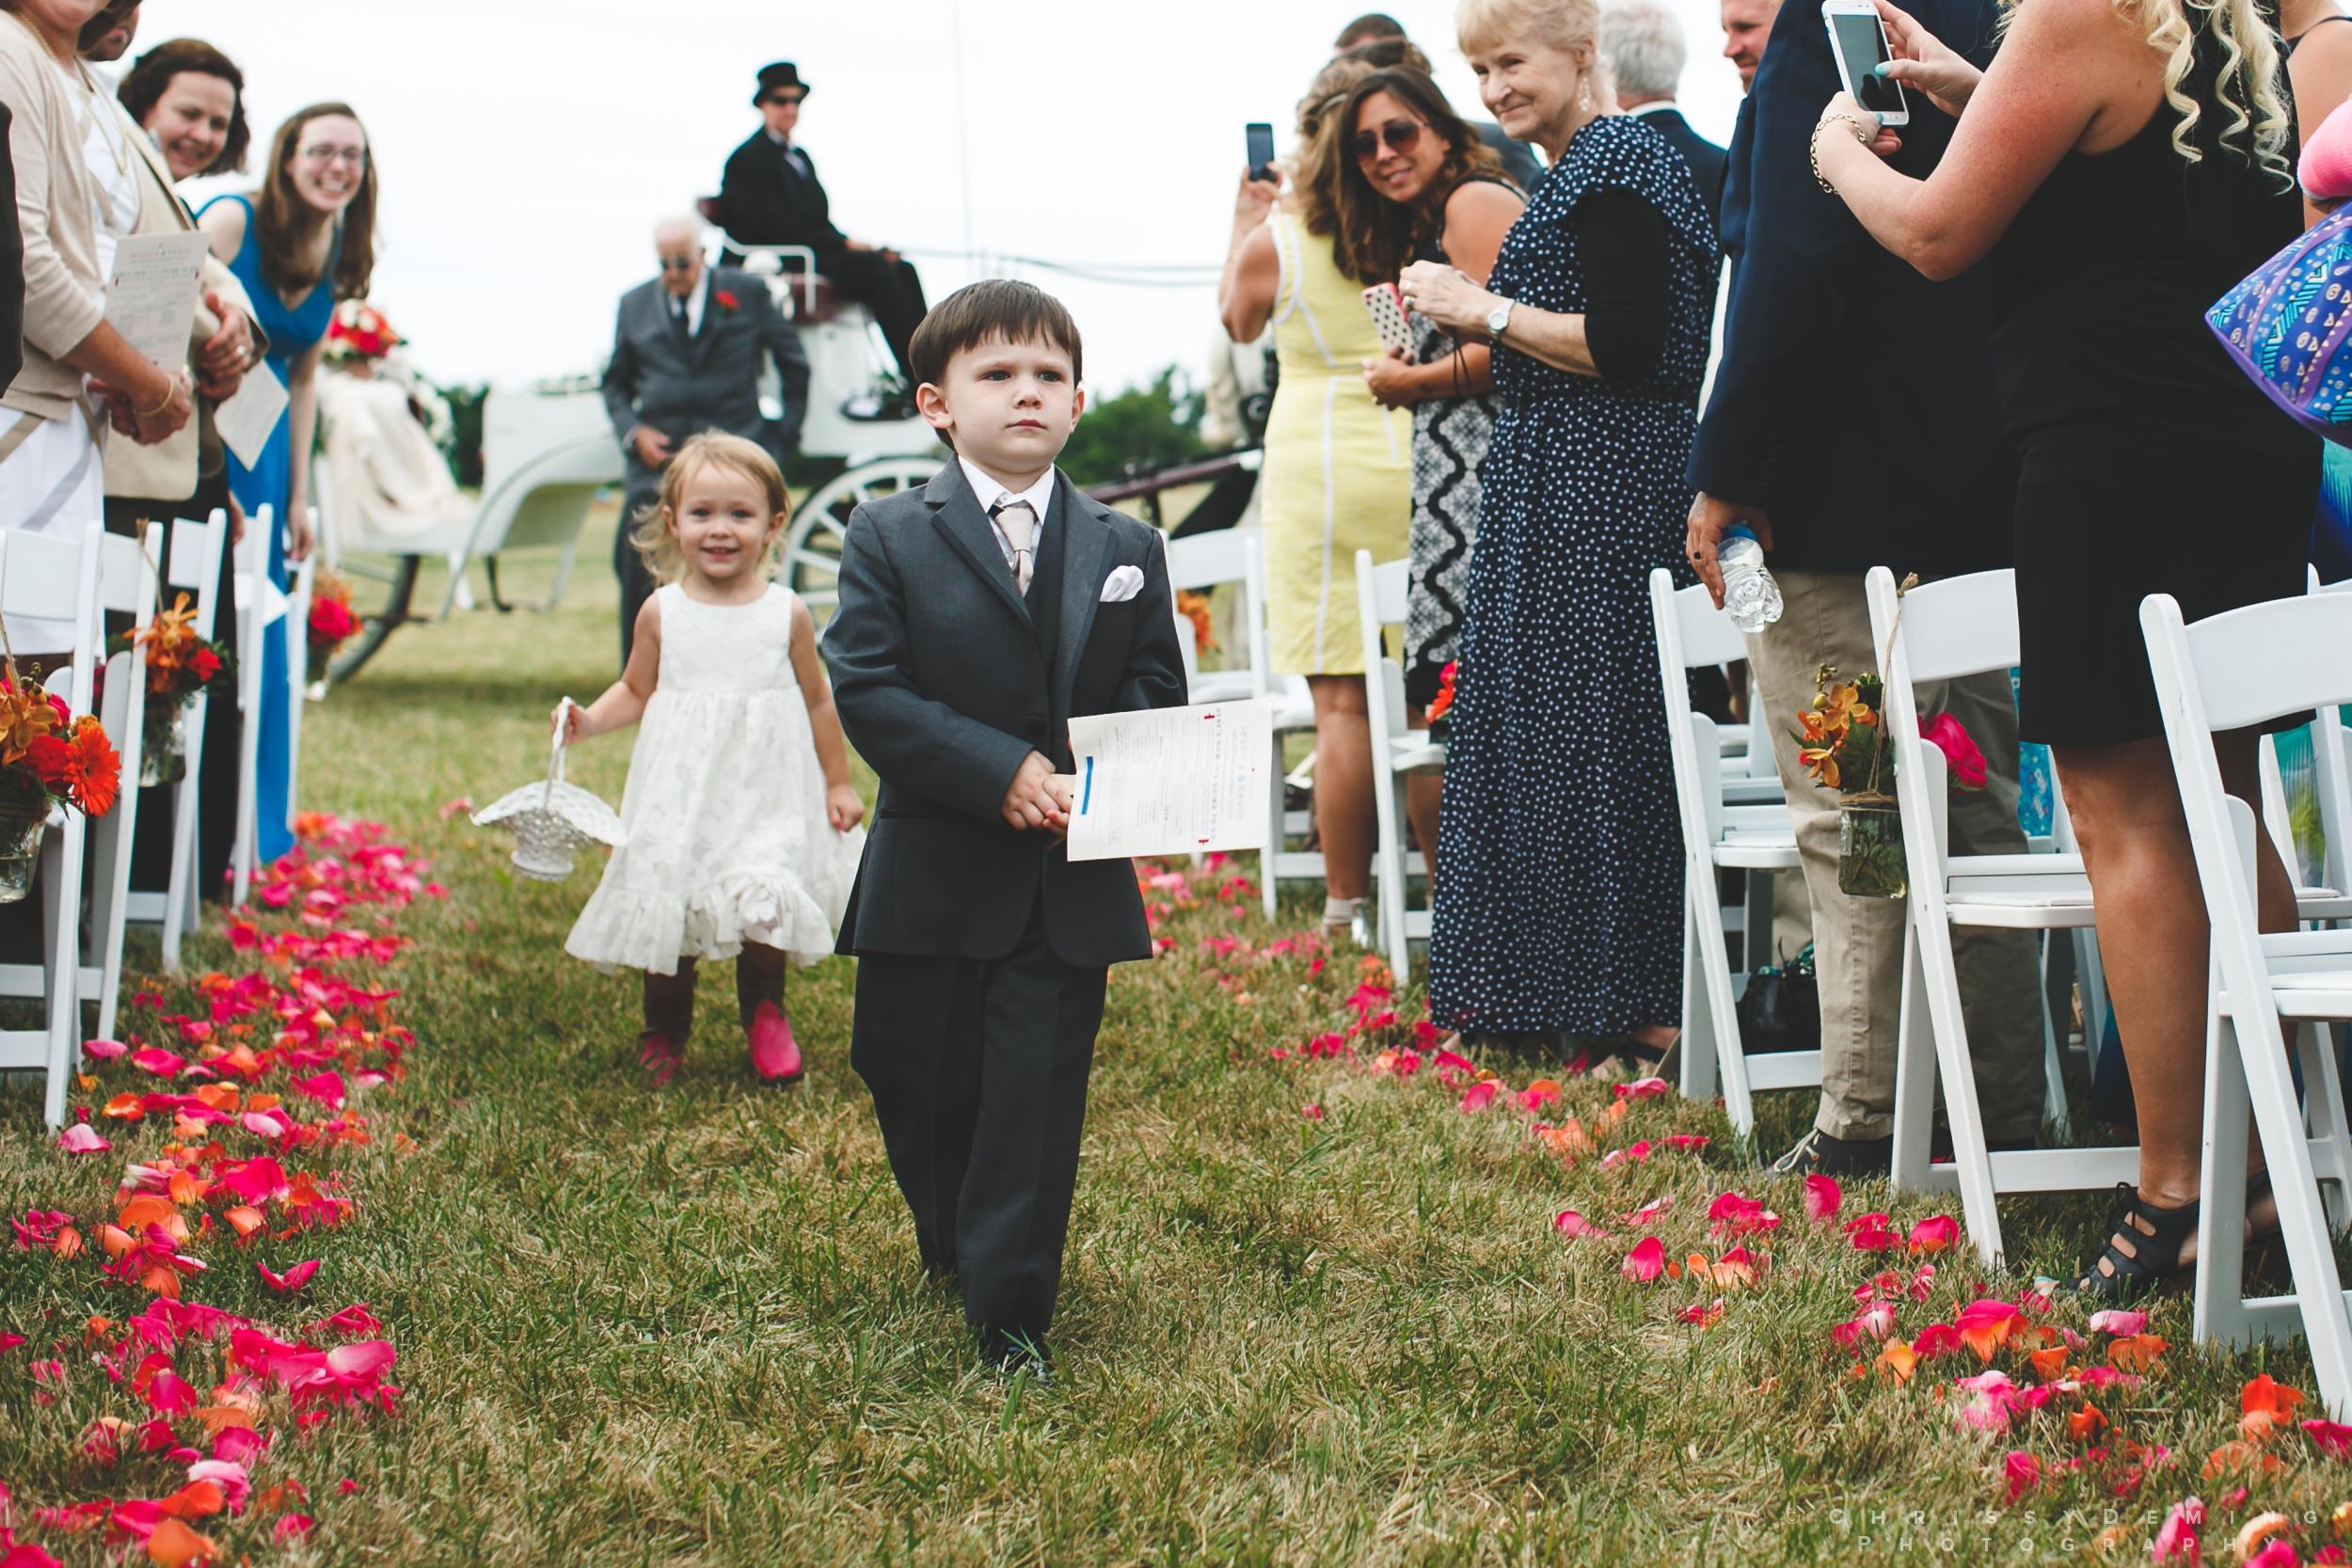 crete_IL_farm_wedding_photographer_0022.jpg